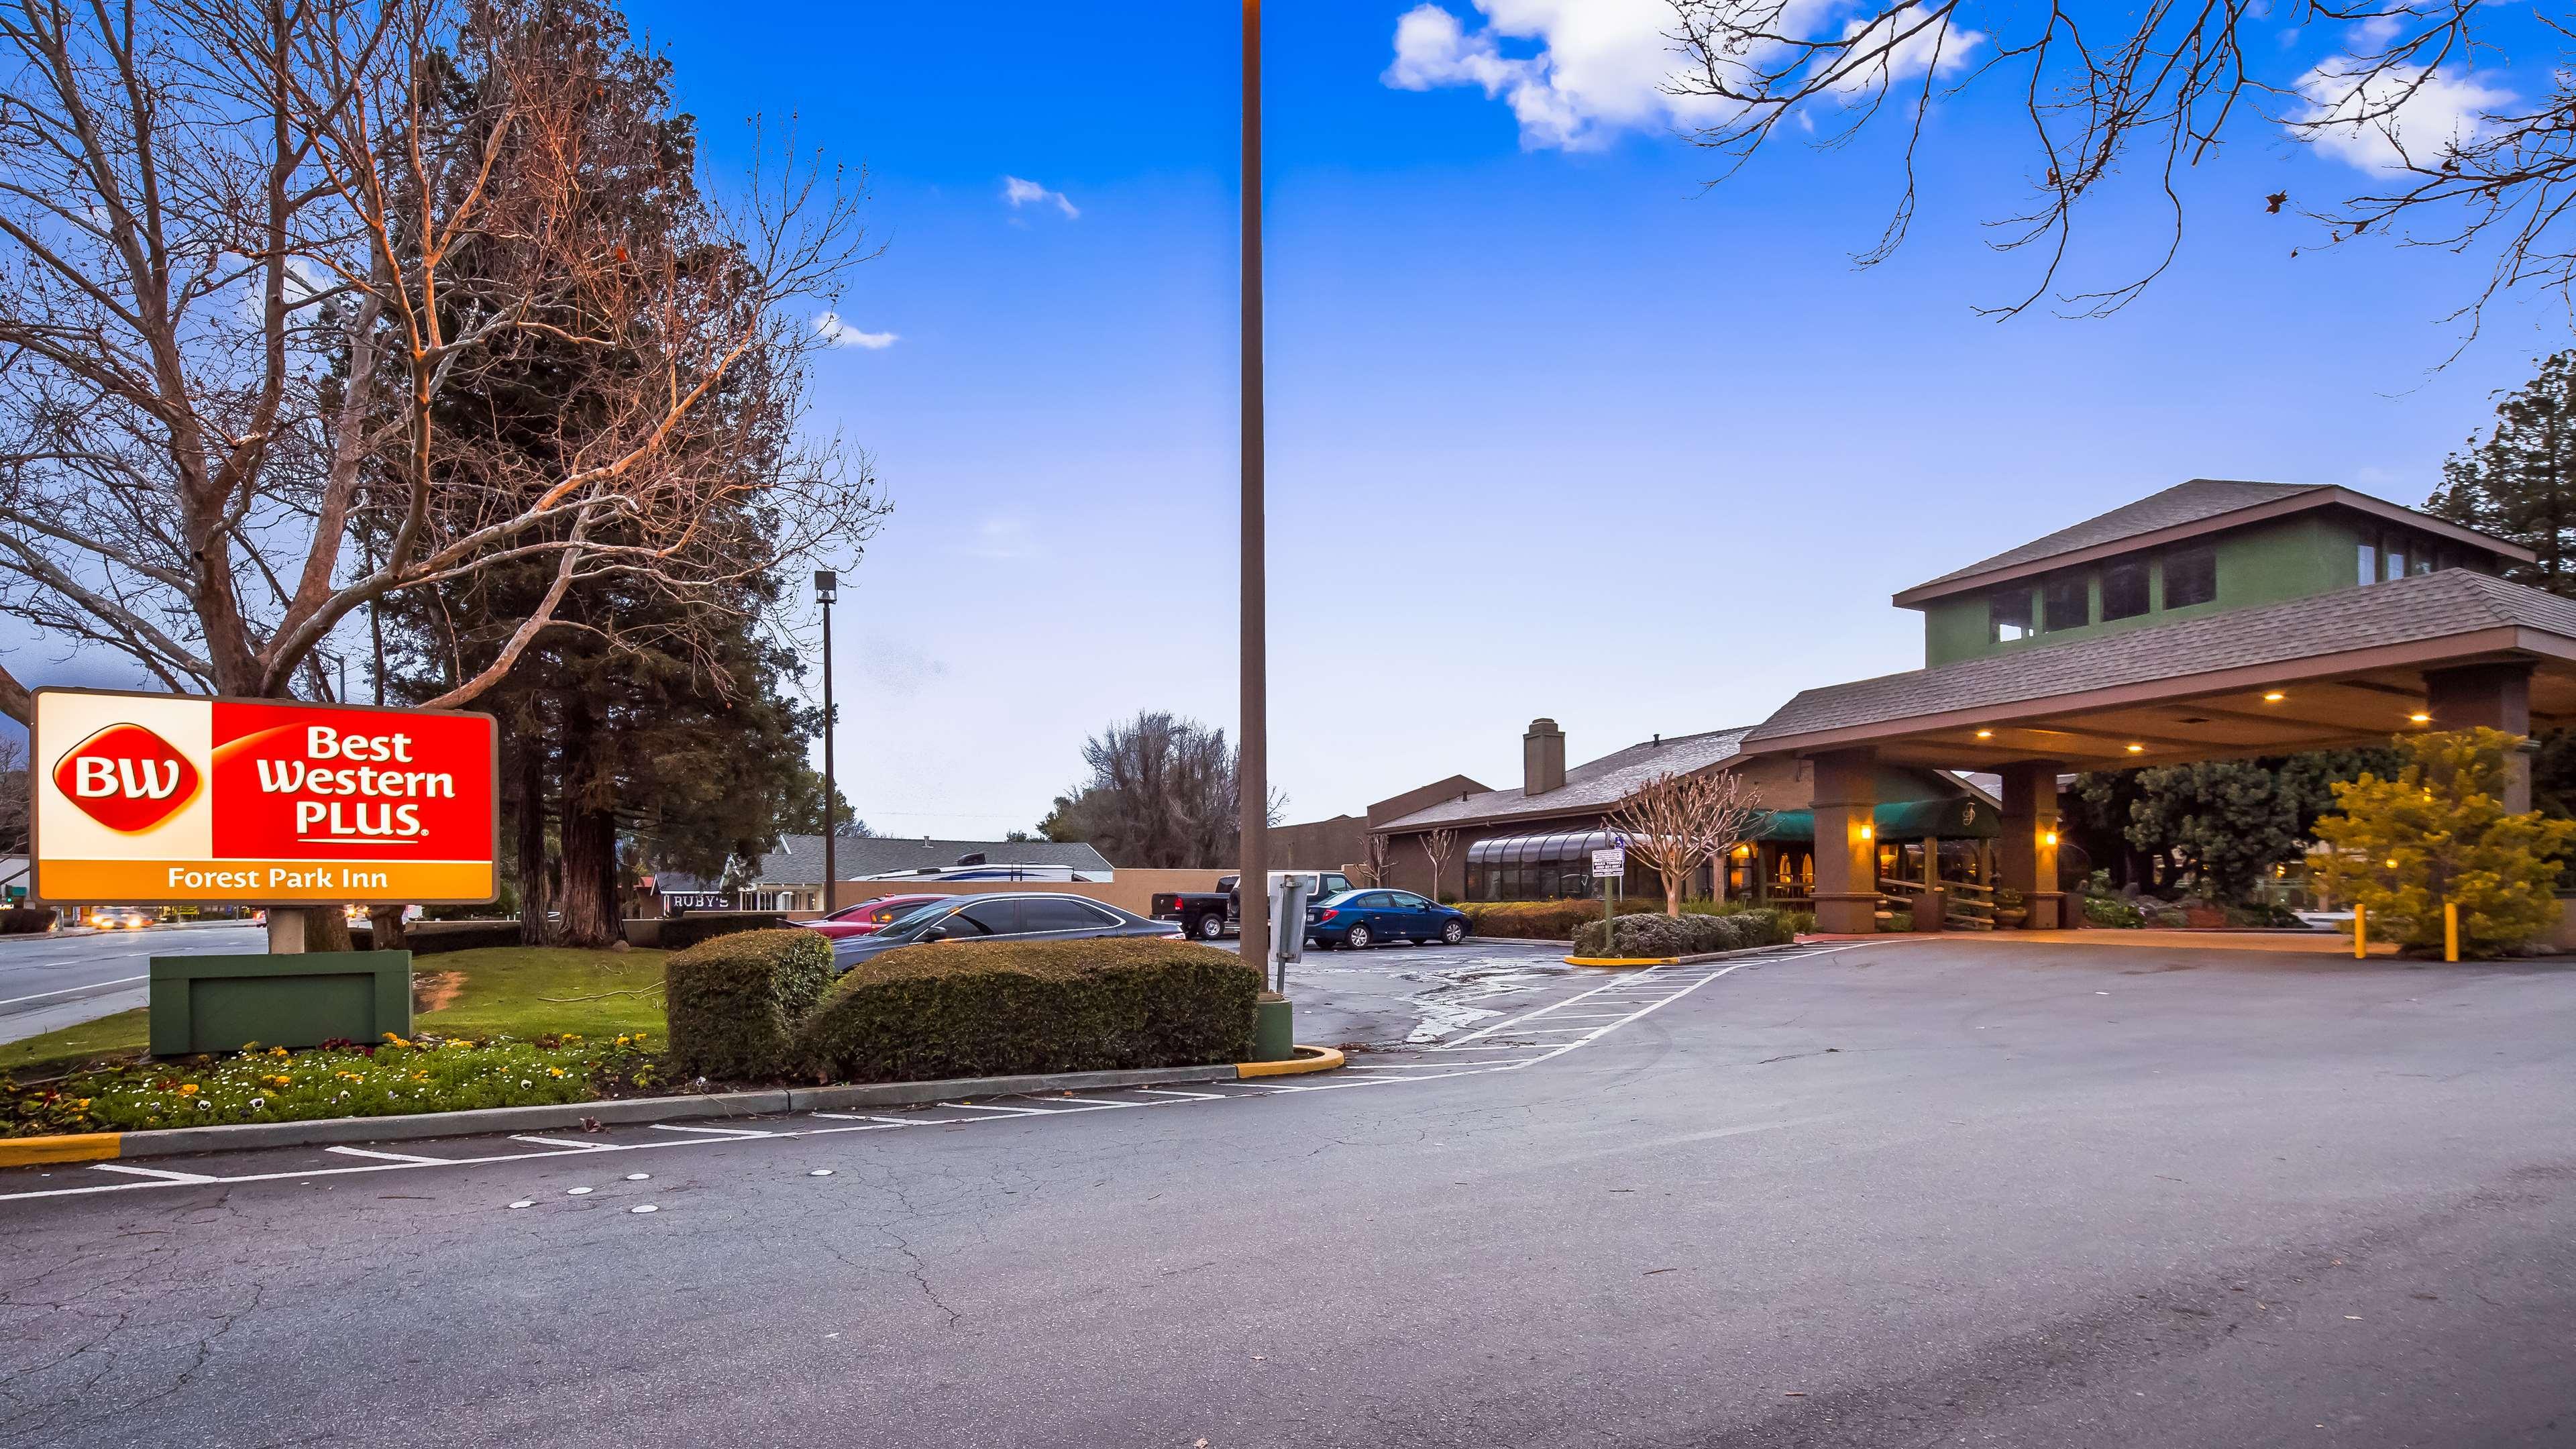 Best Western Plus Forest Park Inn image 1